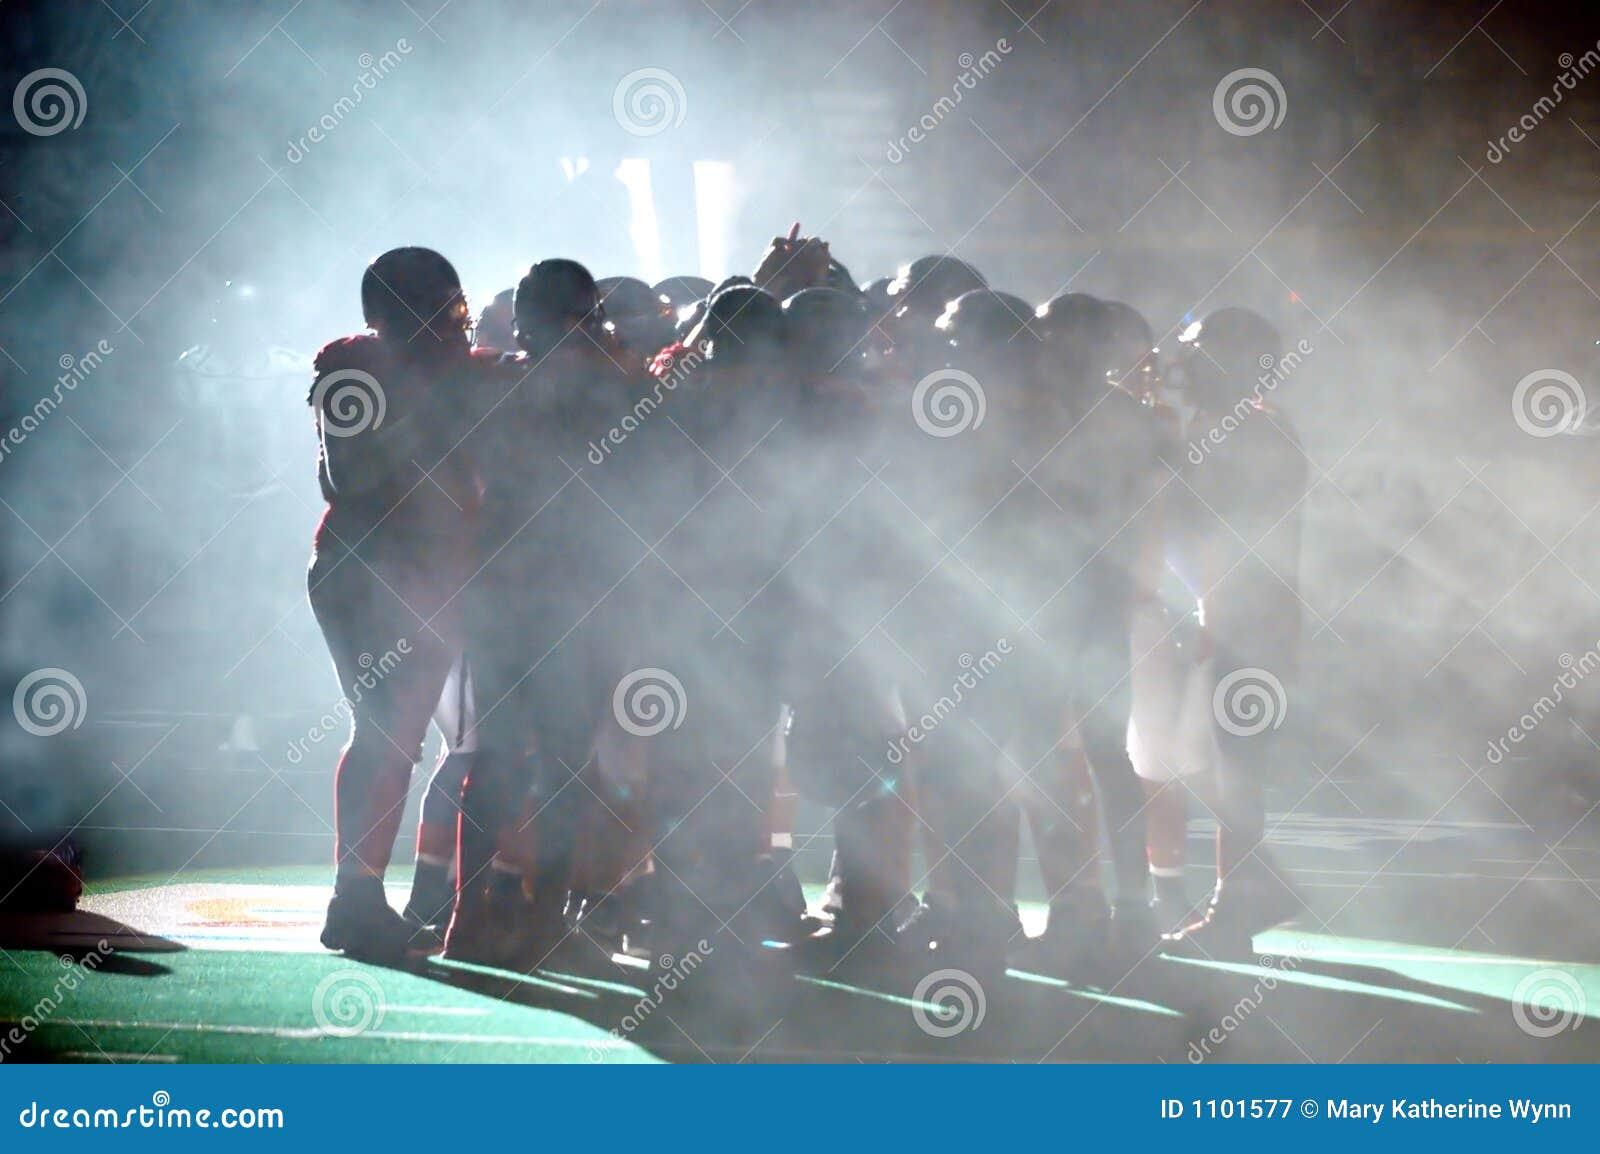 Football Huddle in fog